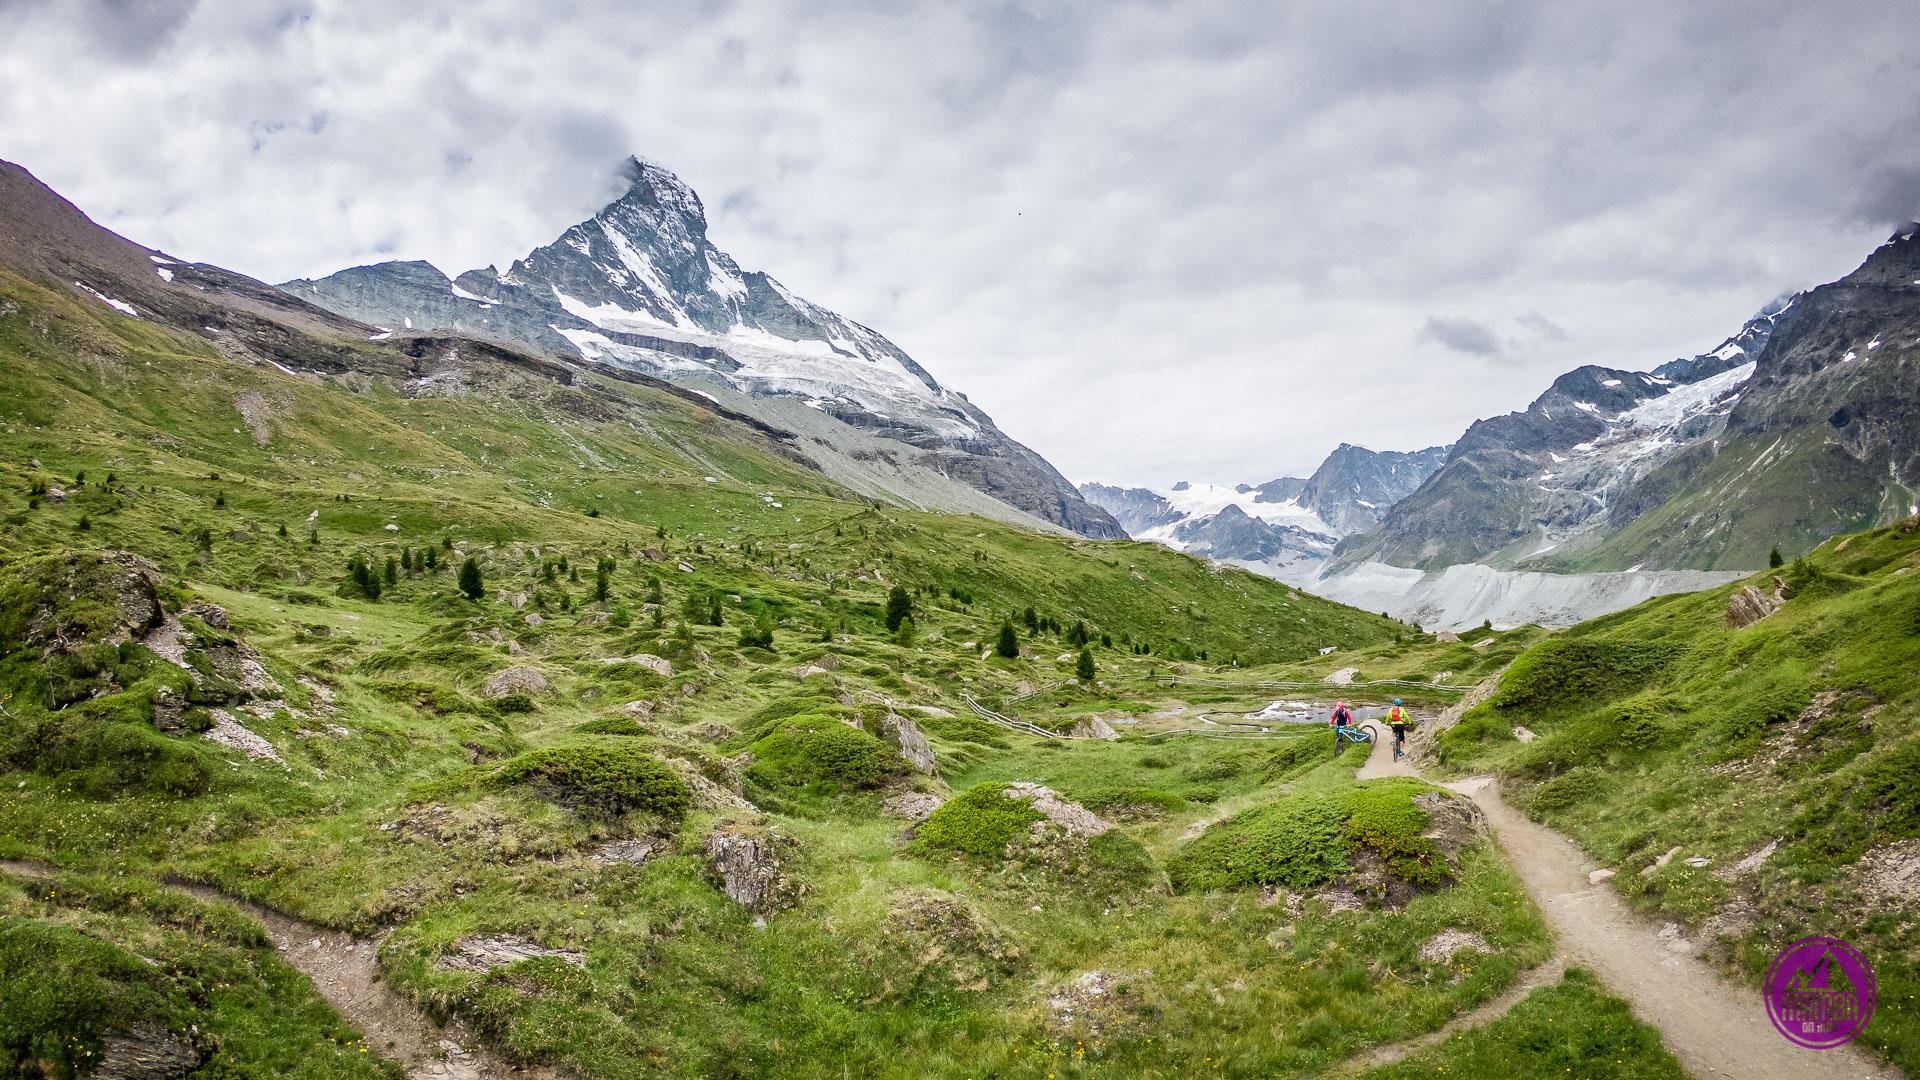 Hobbit Trail Zermatt